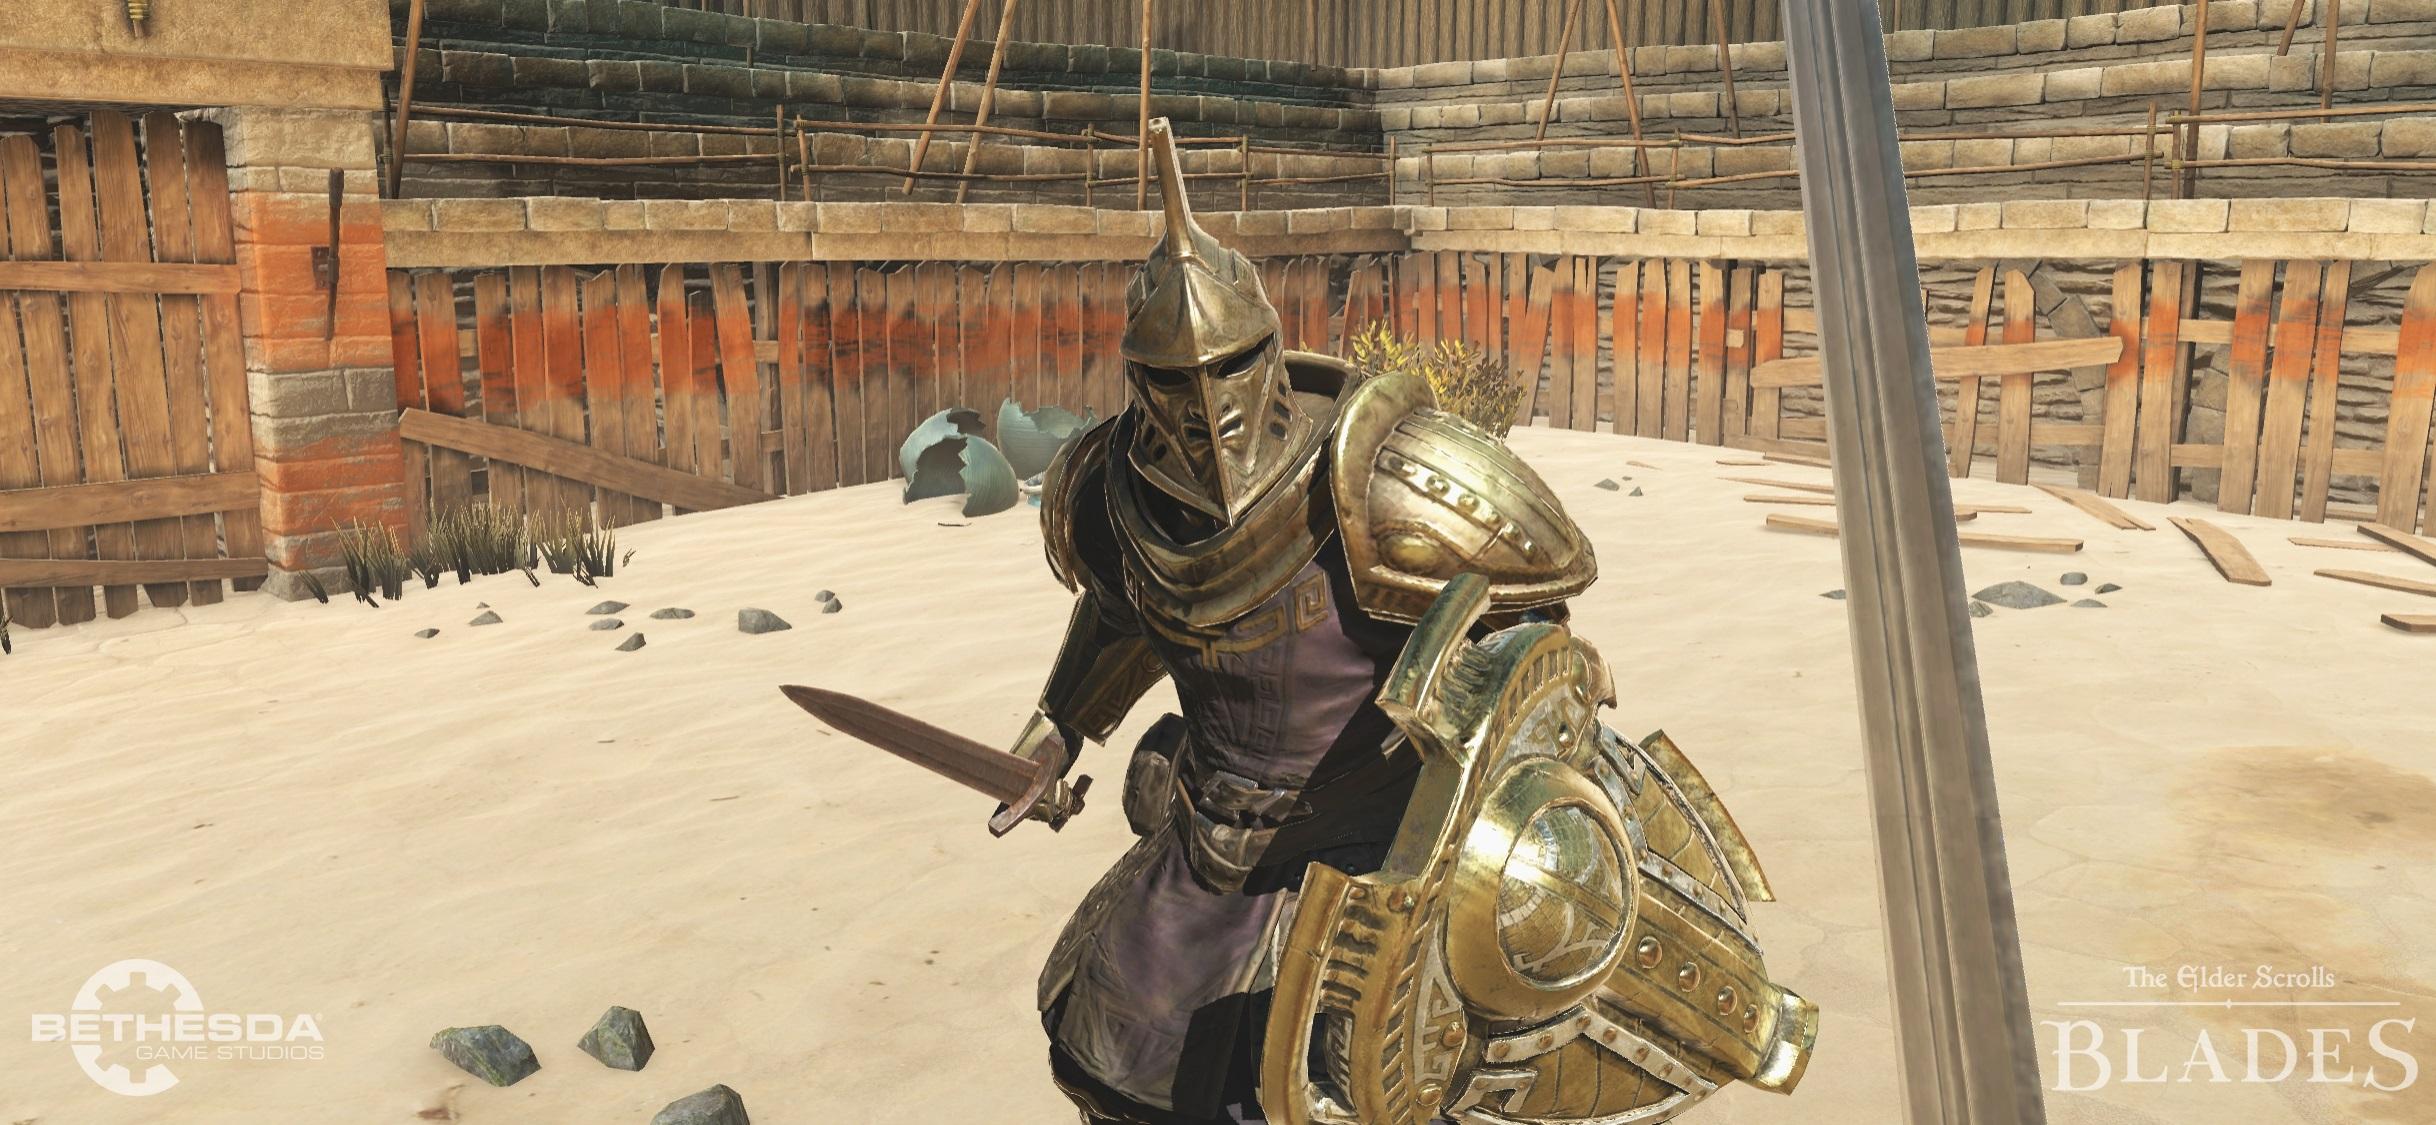 Elder Scrolls Blades combat